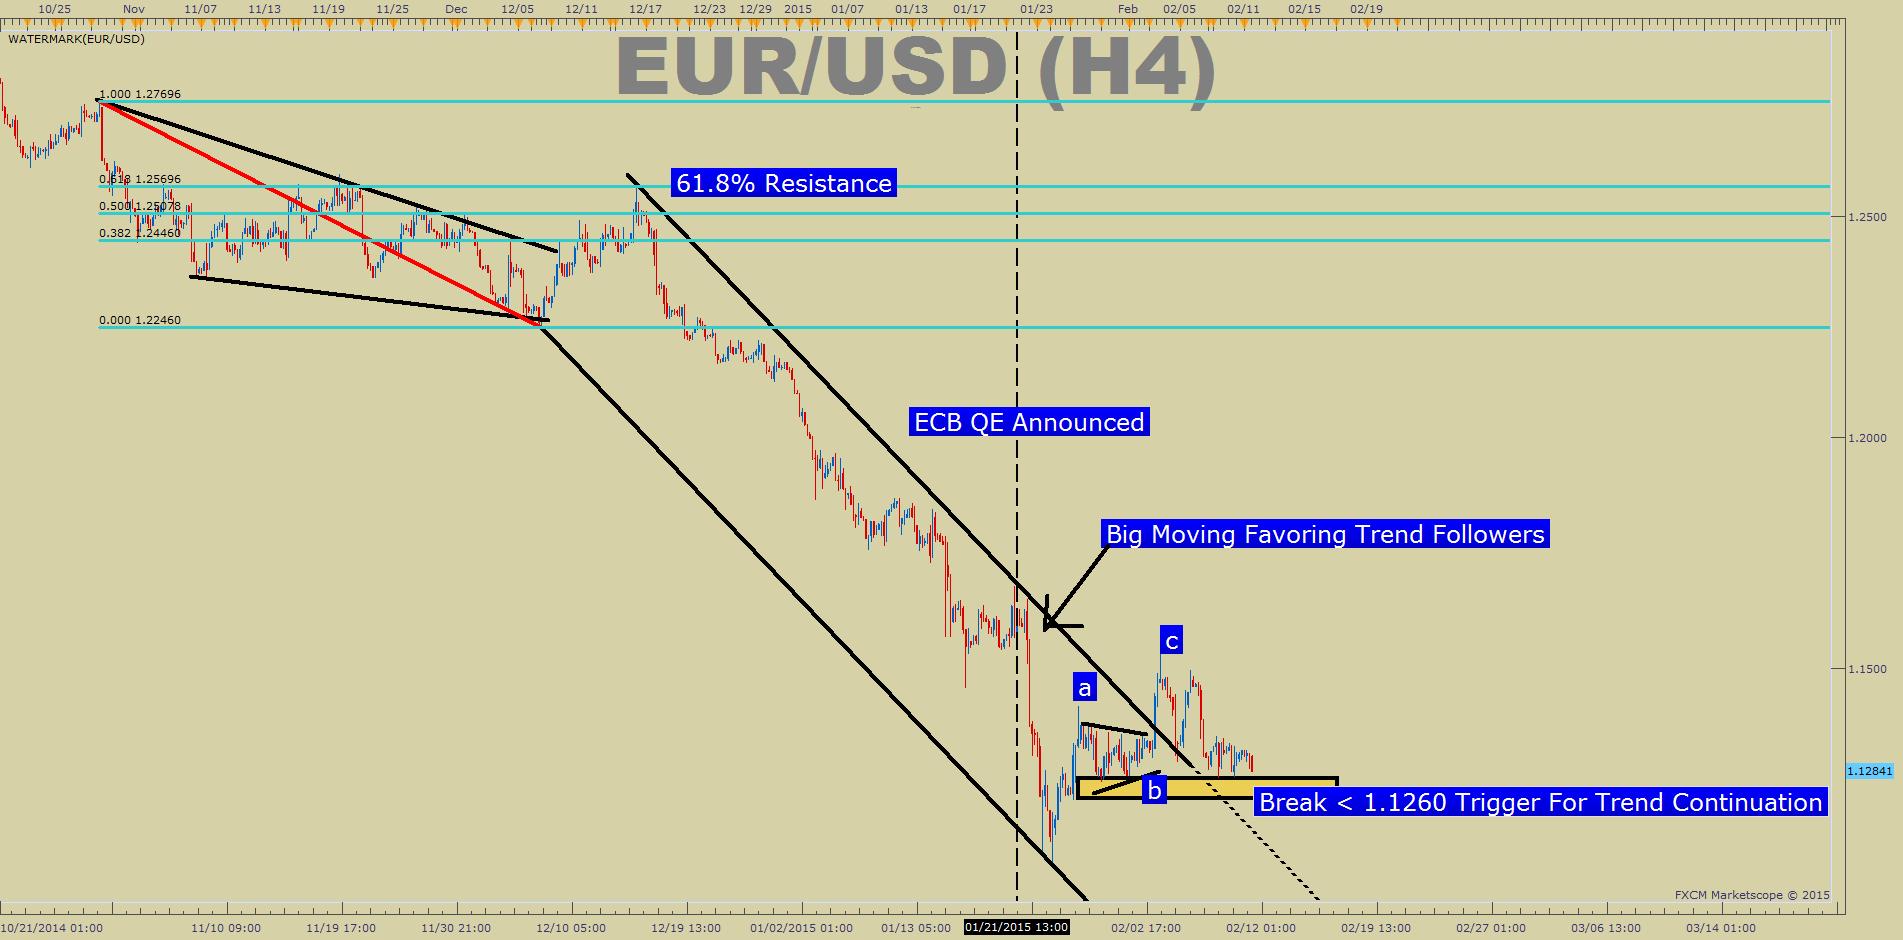 Commodity trading courses switzerland